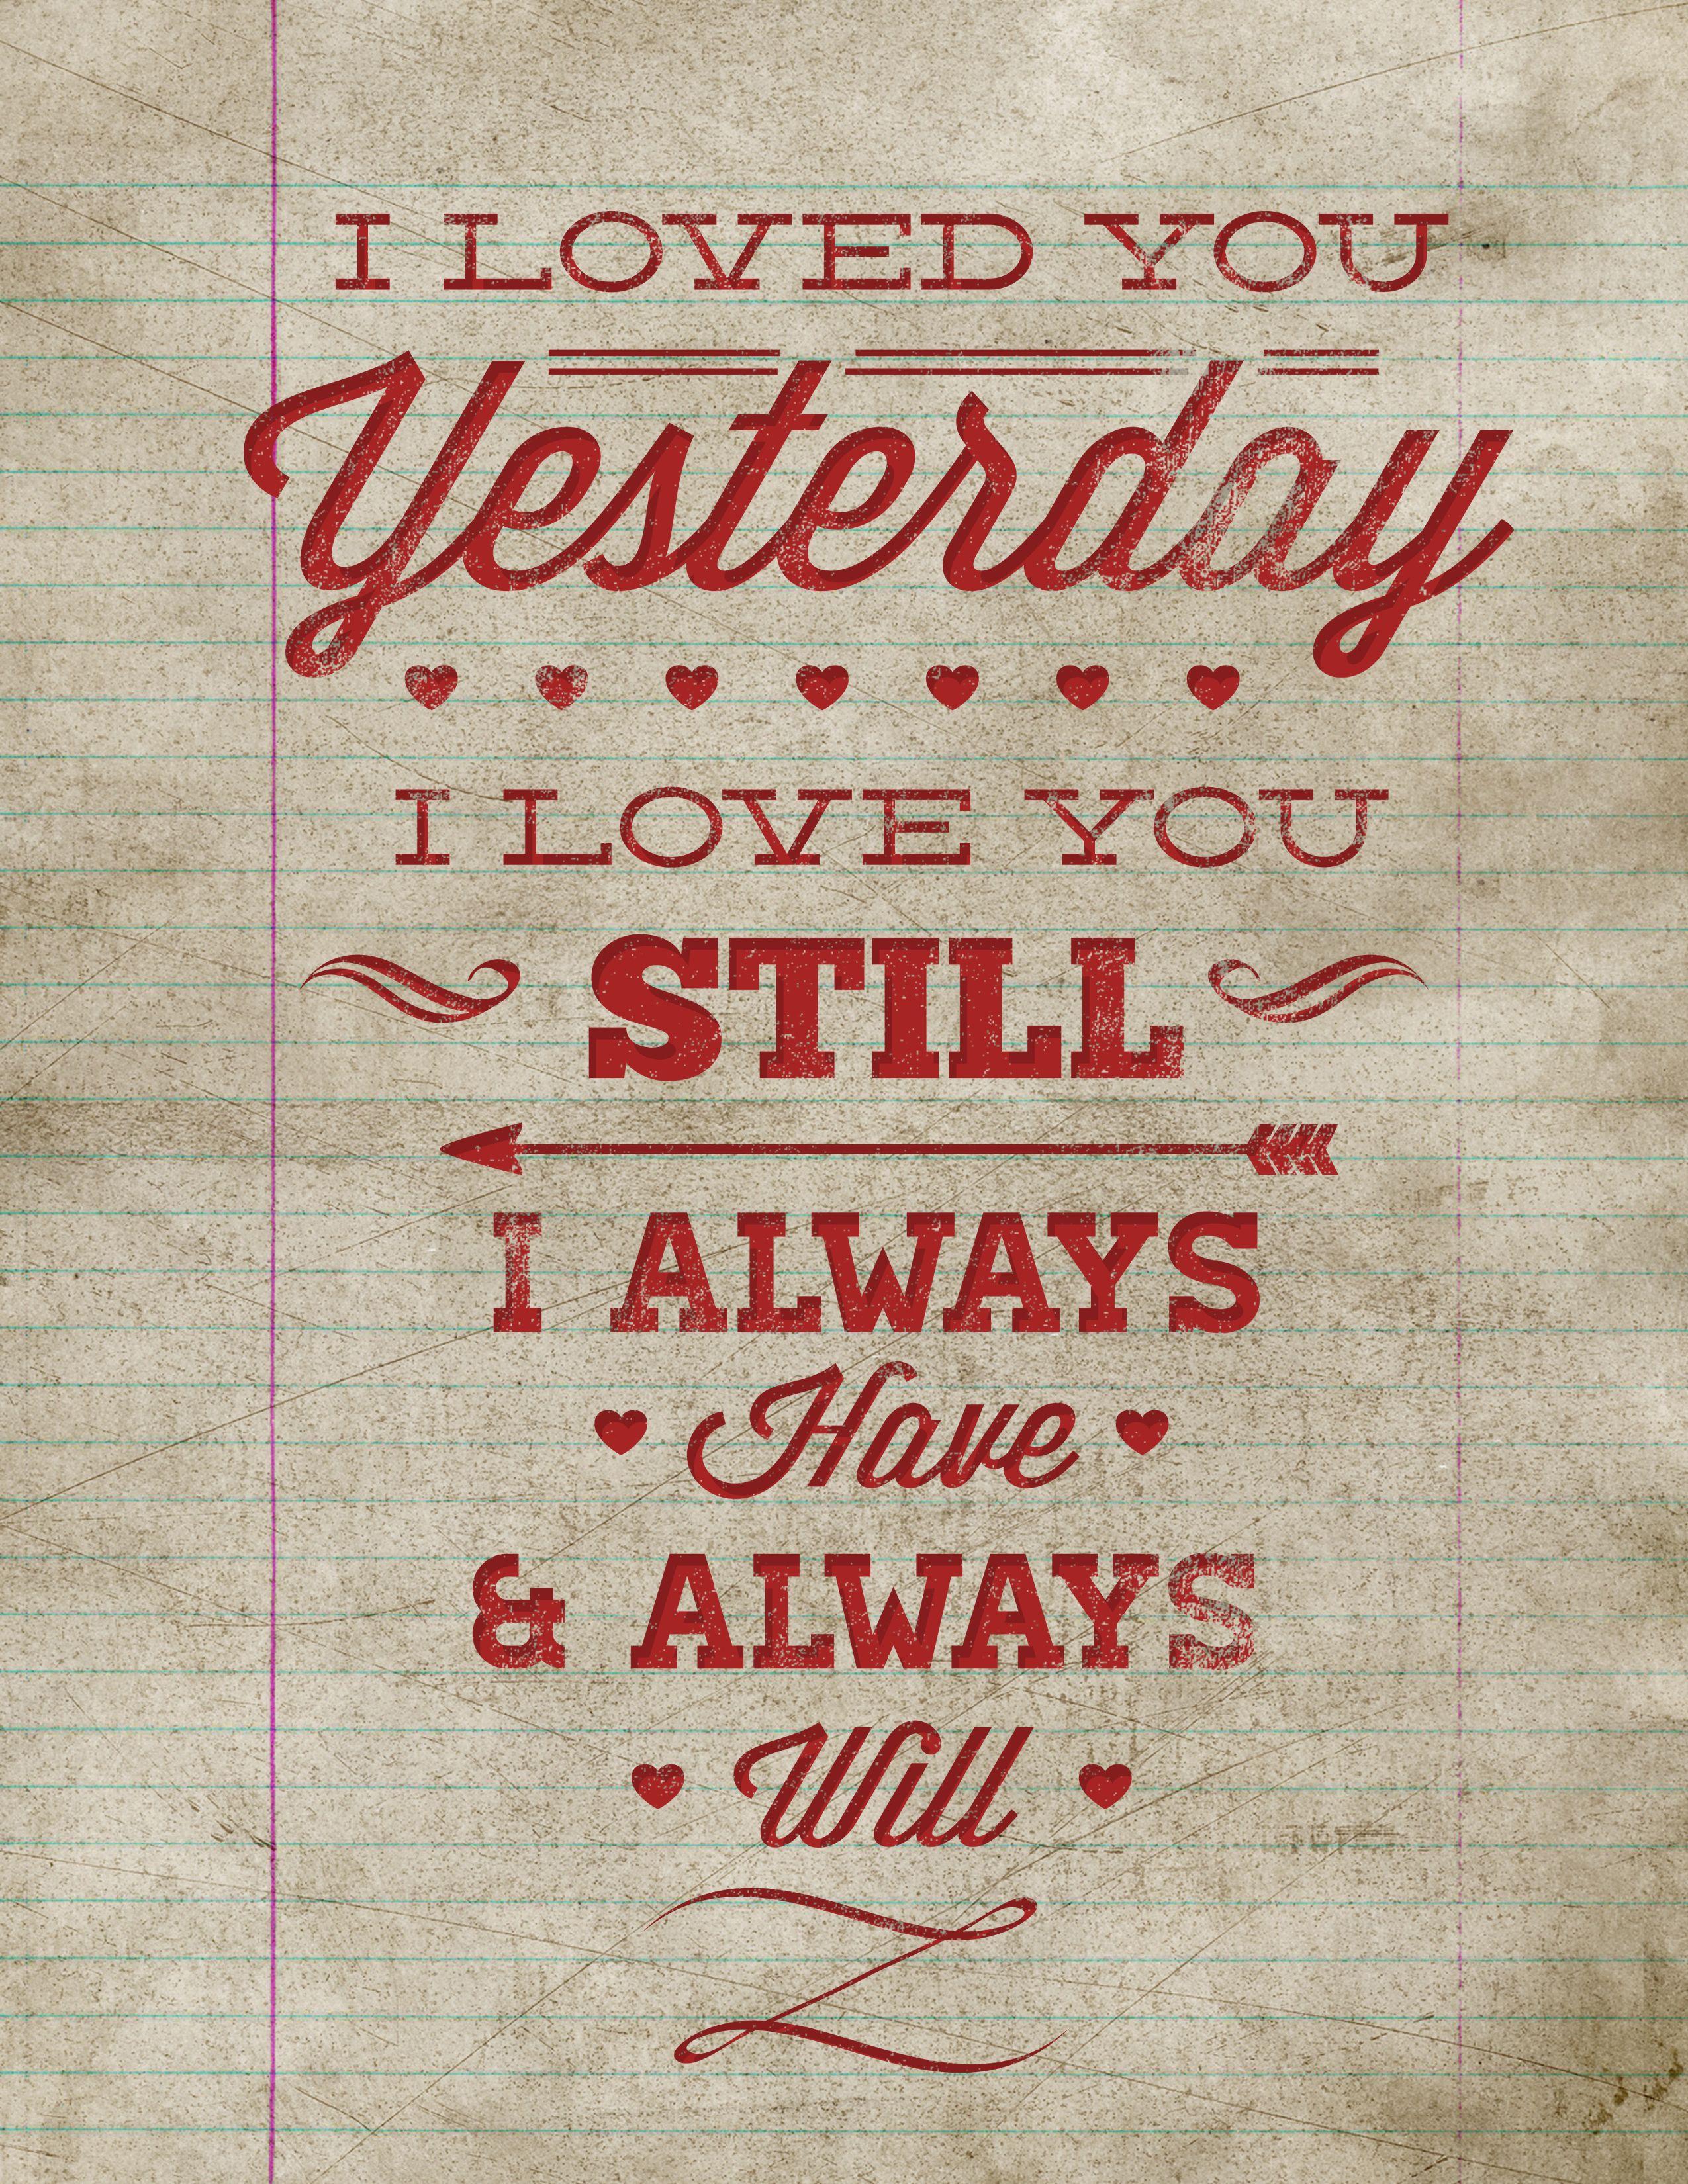 Free Printable Poster – Vintage Valentine Wall Art | Valentine's Day - Free Printable Typography Posters